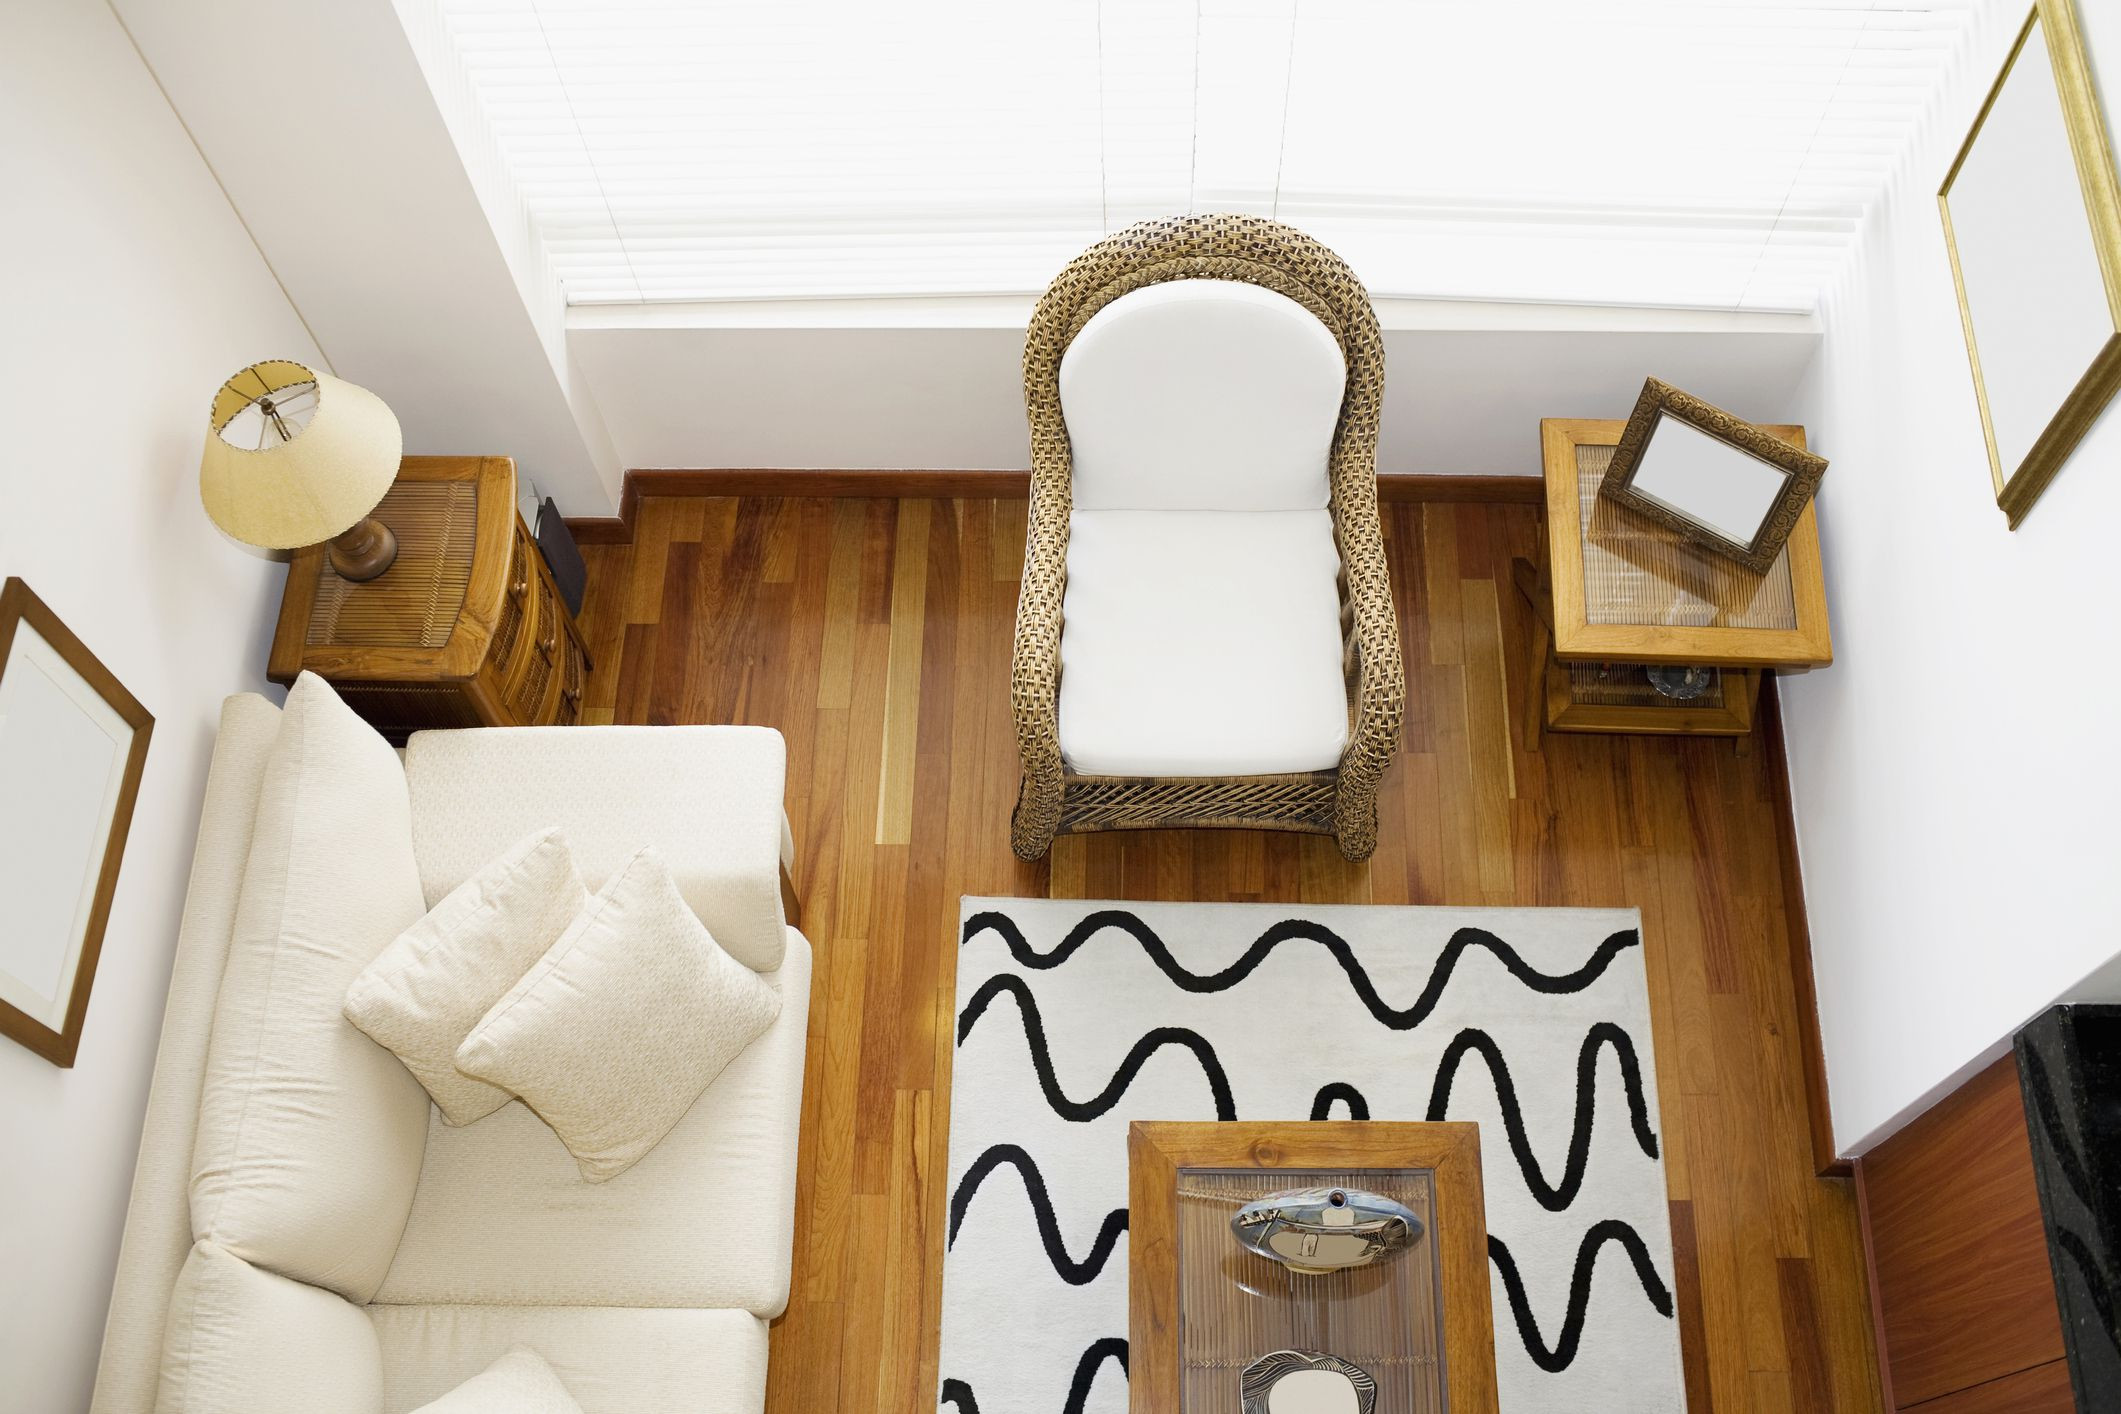 re sanding hardwood floors of stop putting hardwood floors in every room inside 1480712606 hardwood floor rug